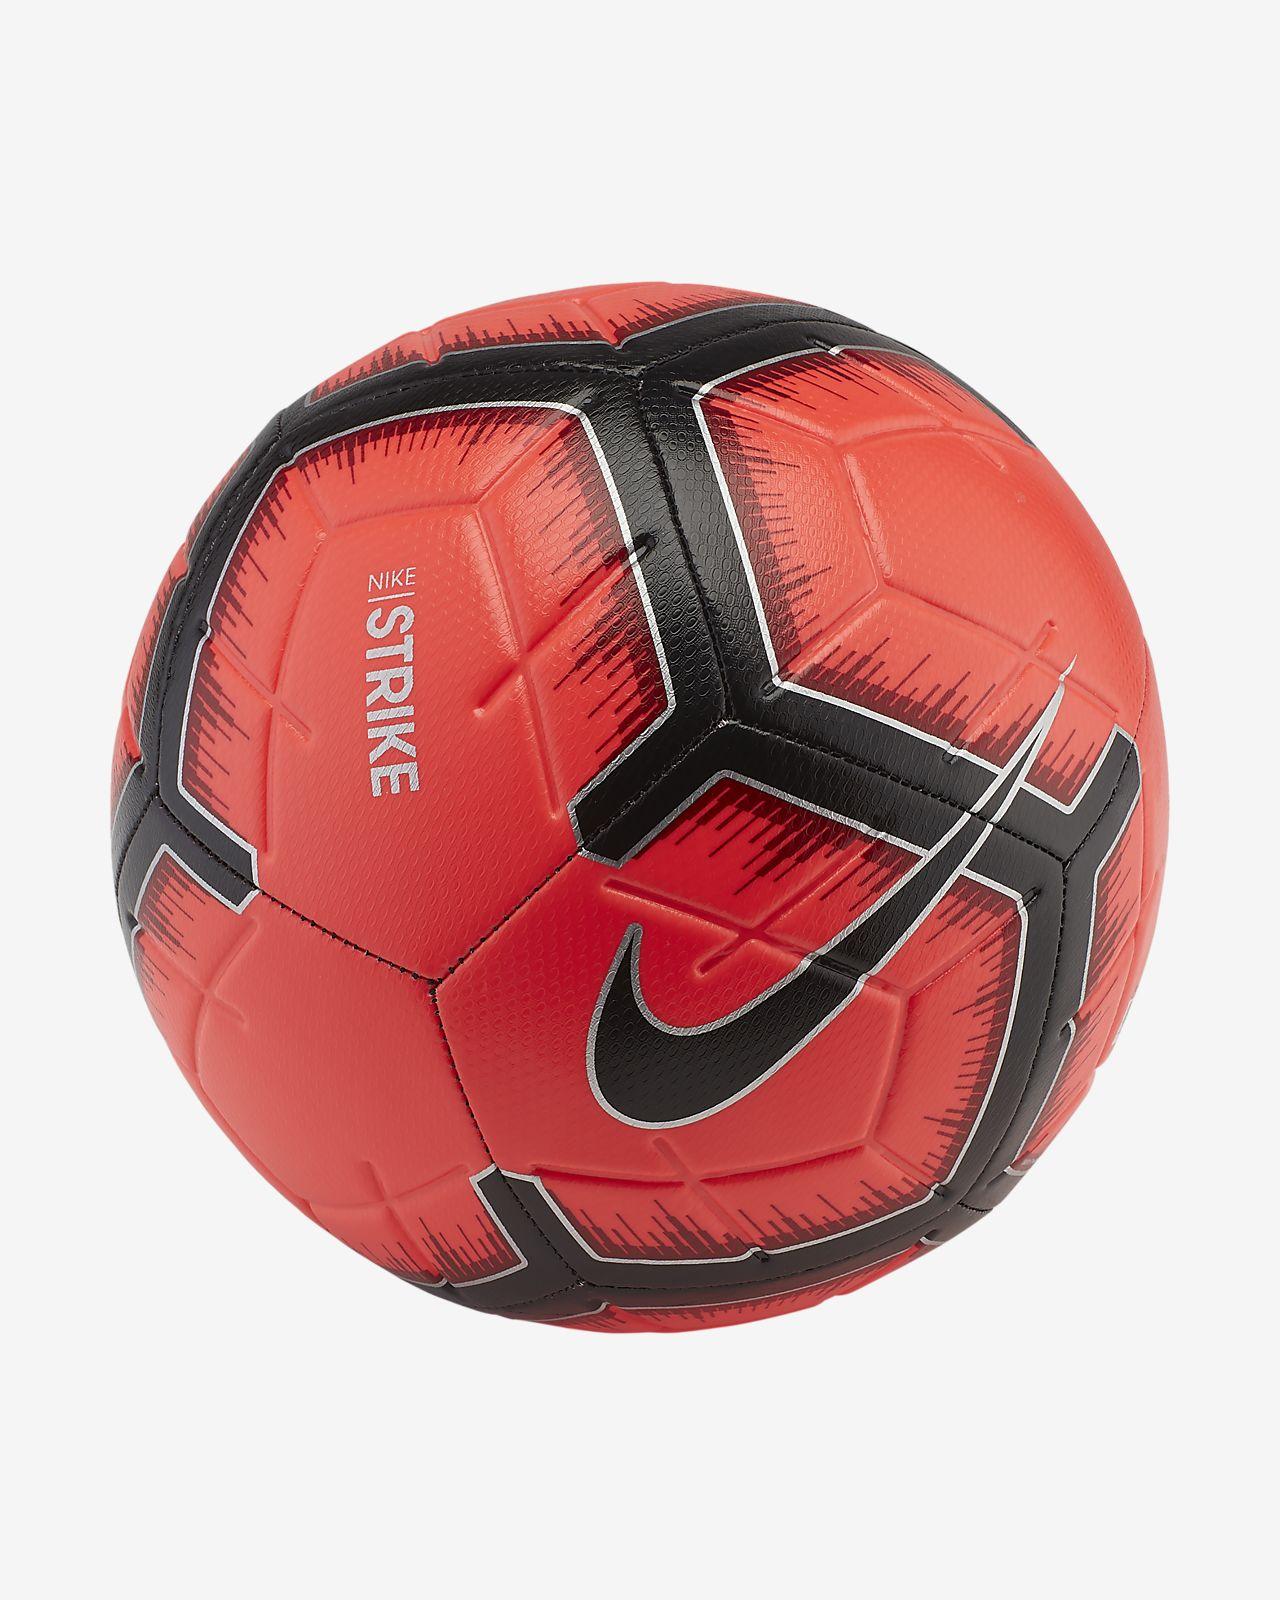 separation shoes a4886 6723b Football. Nike Strike